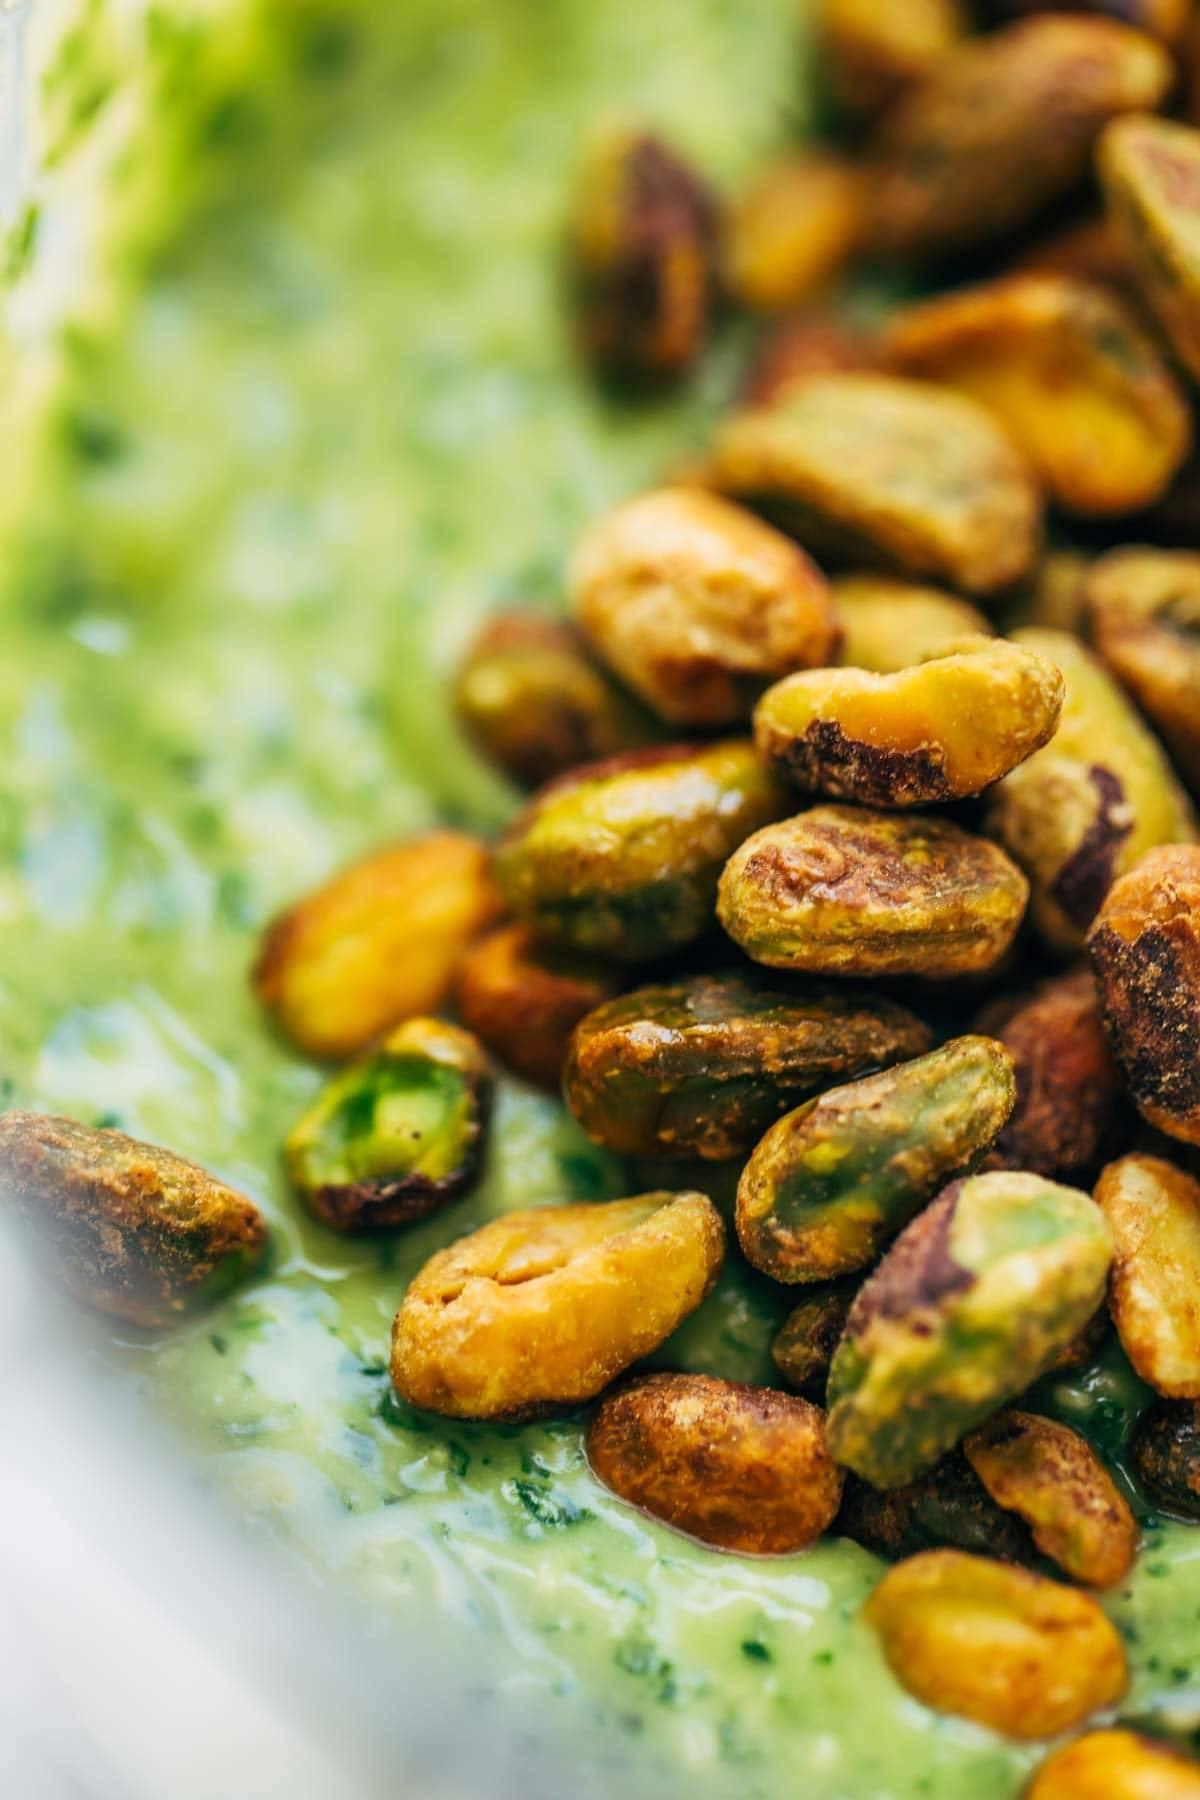 5 Minute Magic Green Sauce Recipe - Pinch of Yum